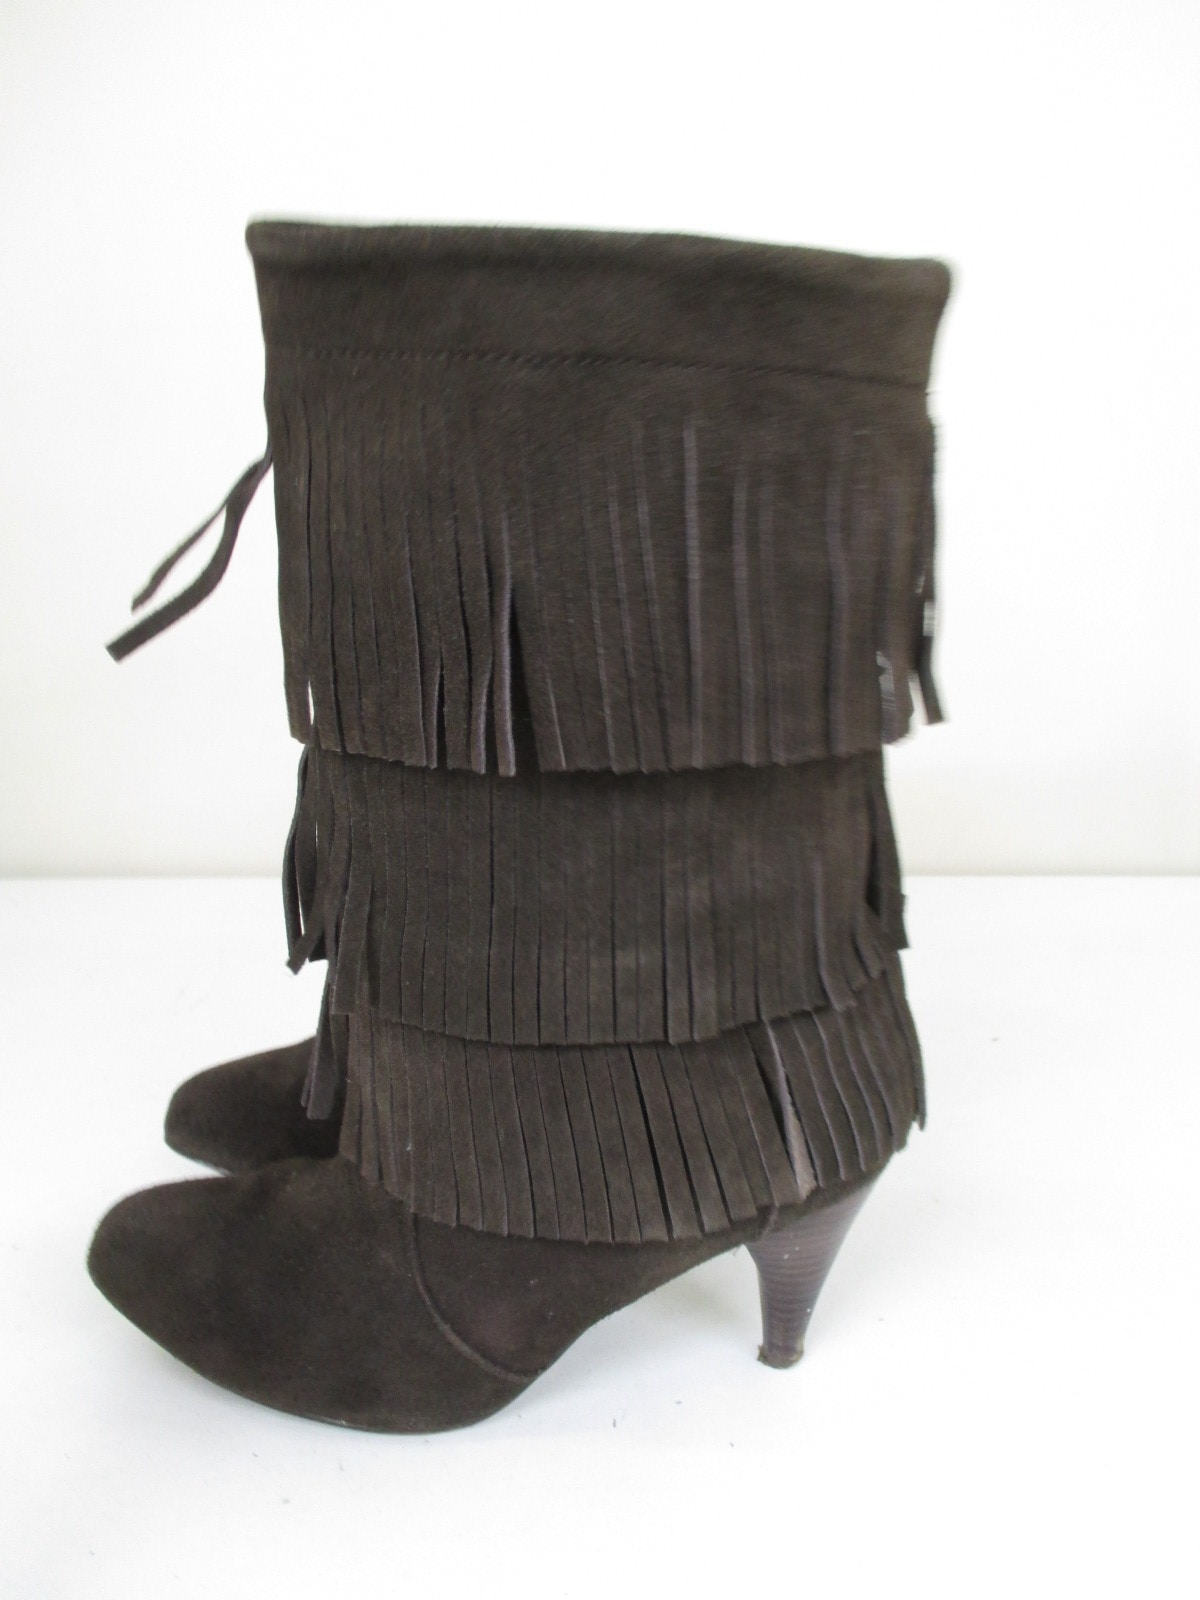 CHINESE LAUNDRY(チャイニーズランドリー)のブーツ